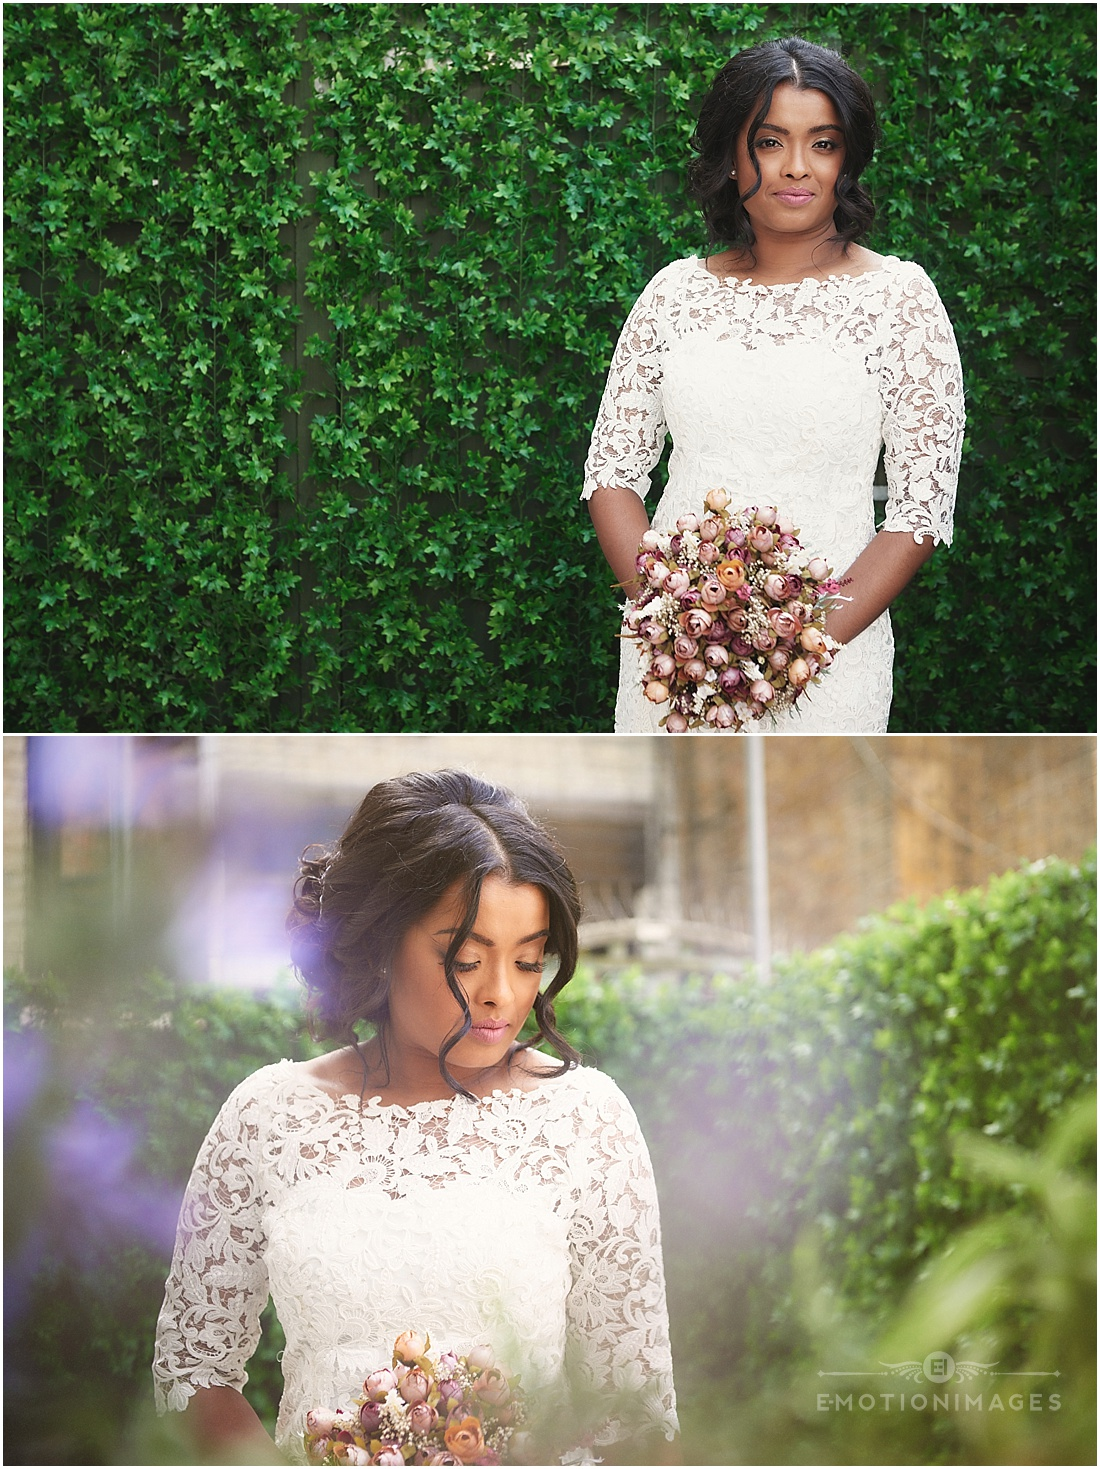 Searcys_Knightsbridge_London_wedding_e-motion_images_008.JPG